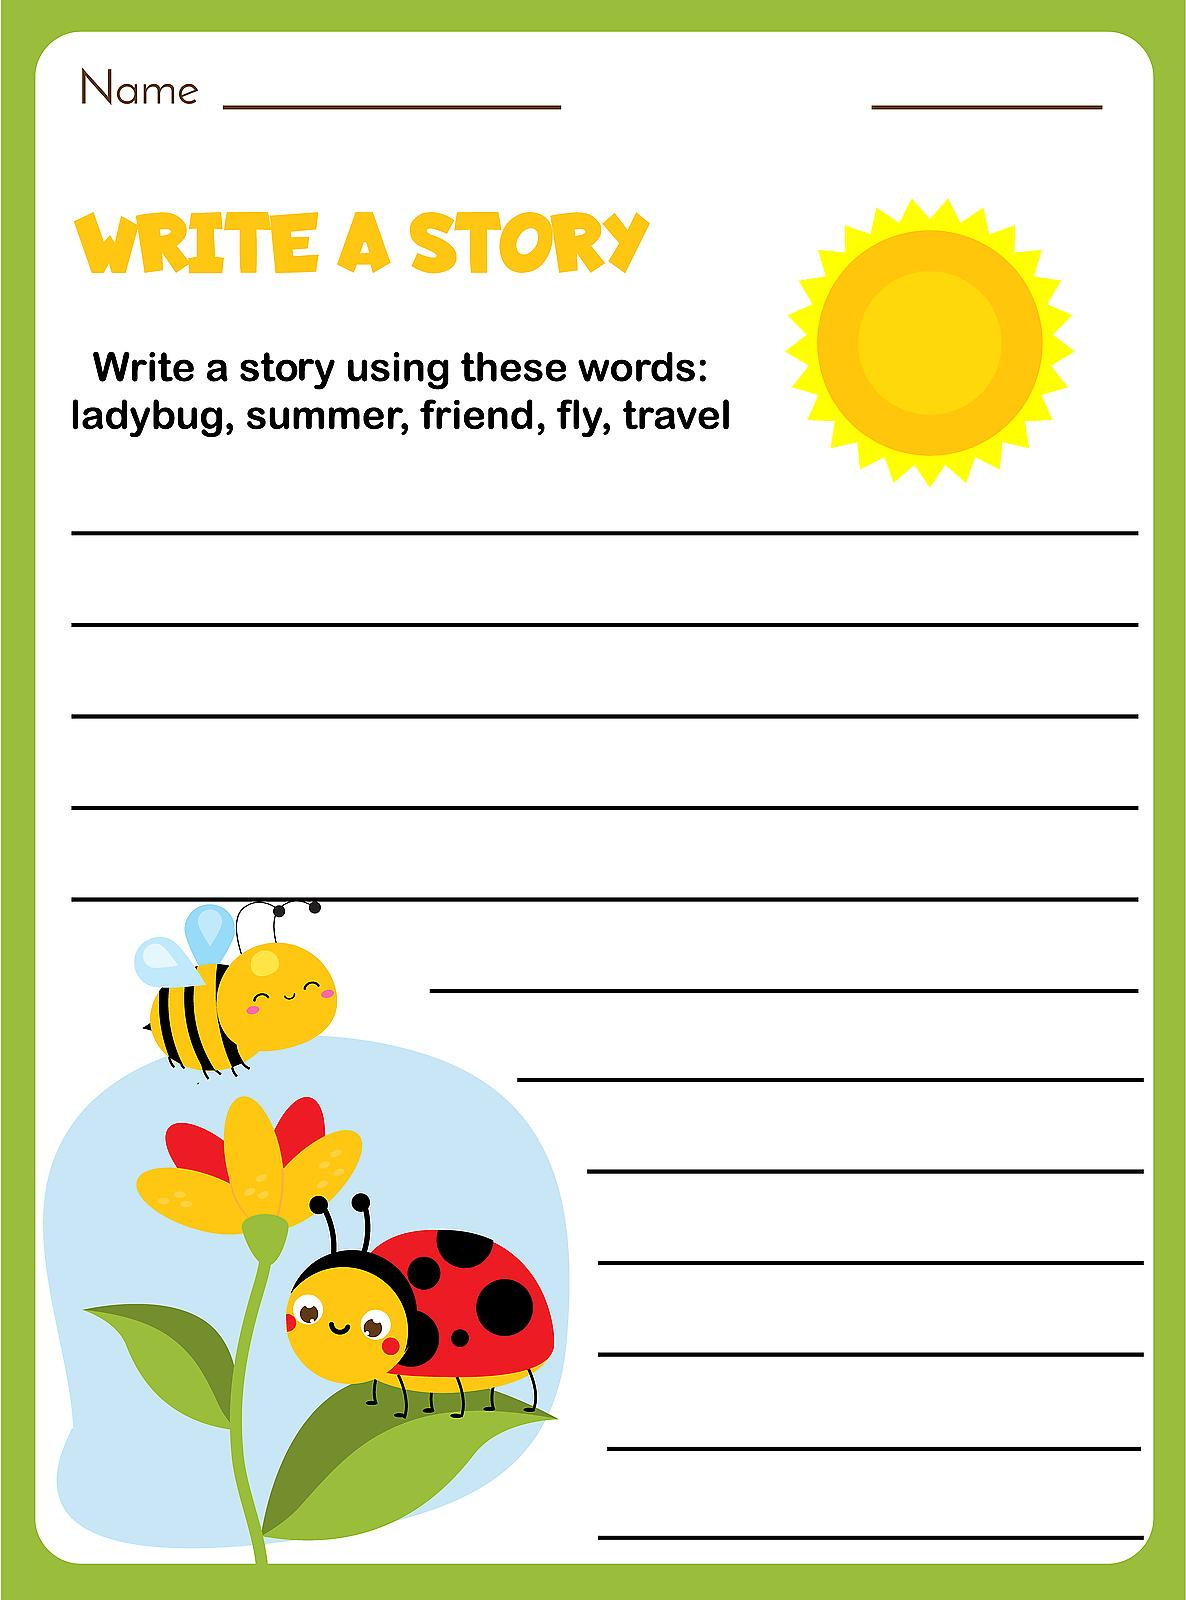 writing prompts for kids 12 fun blank printable writing